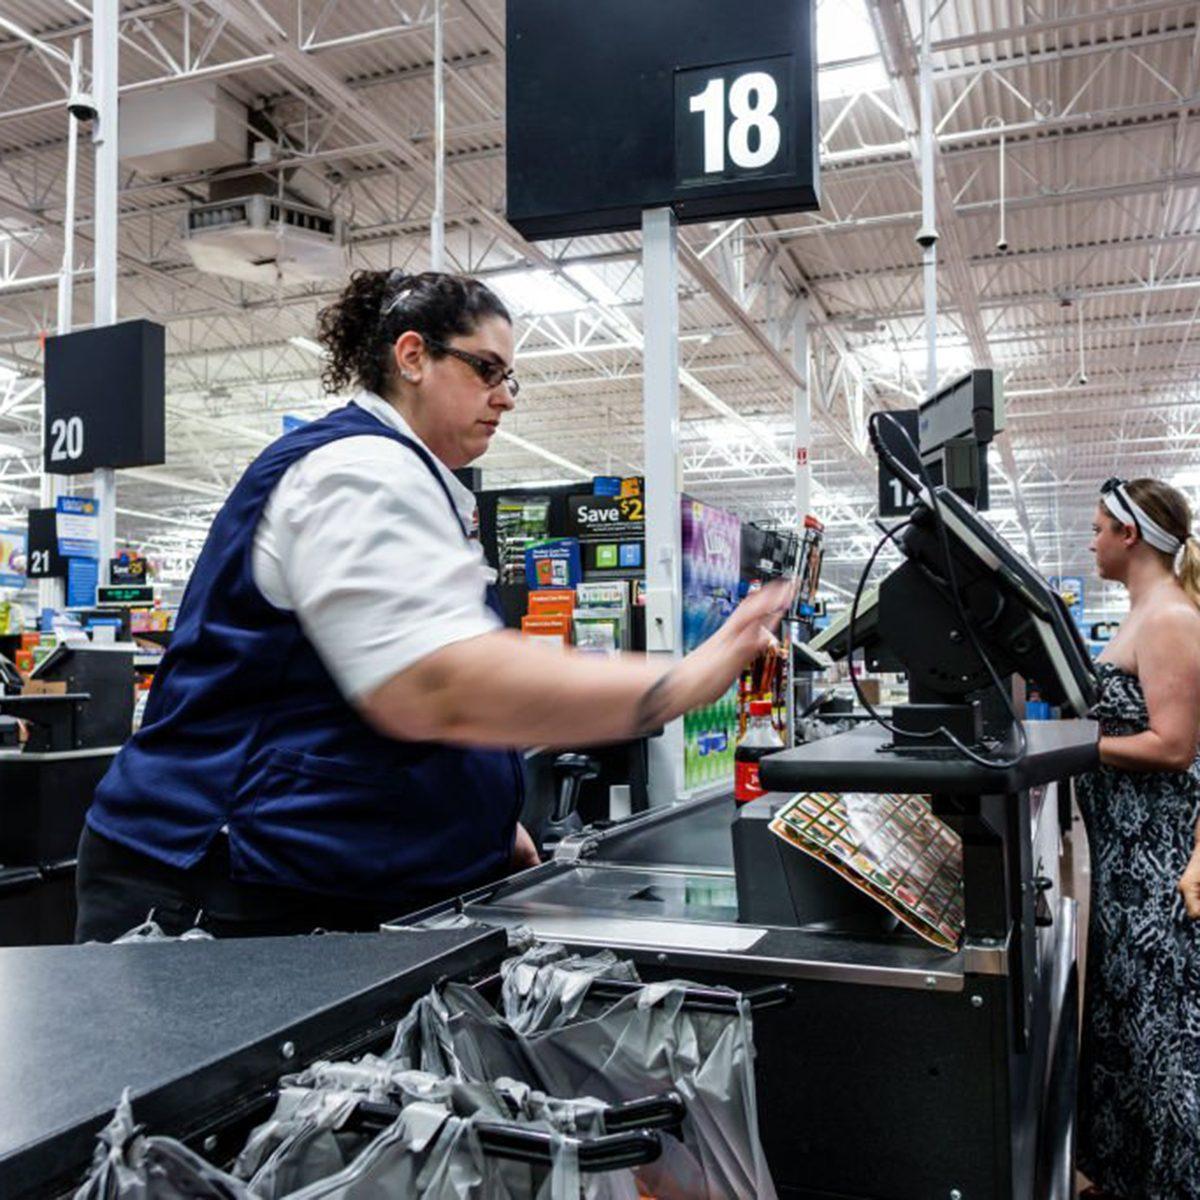 Walmart cashier checking someone out